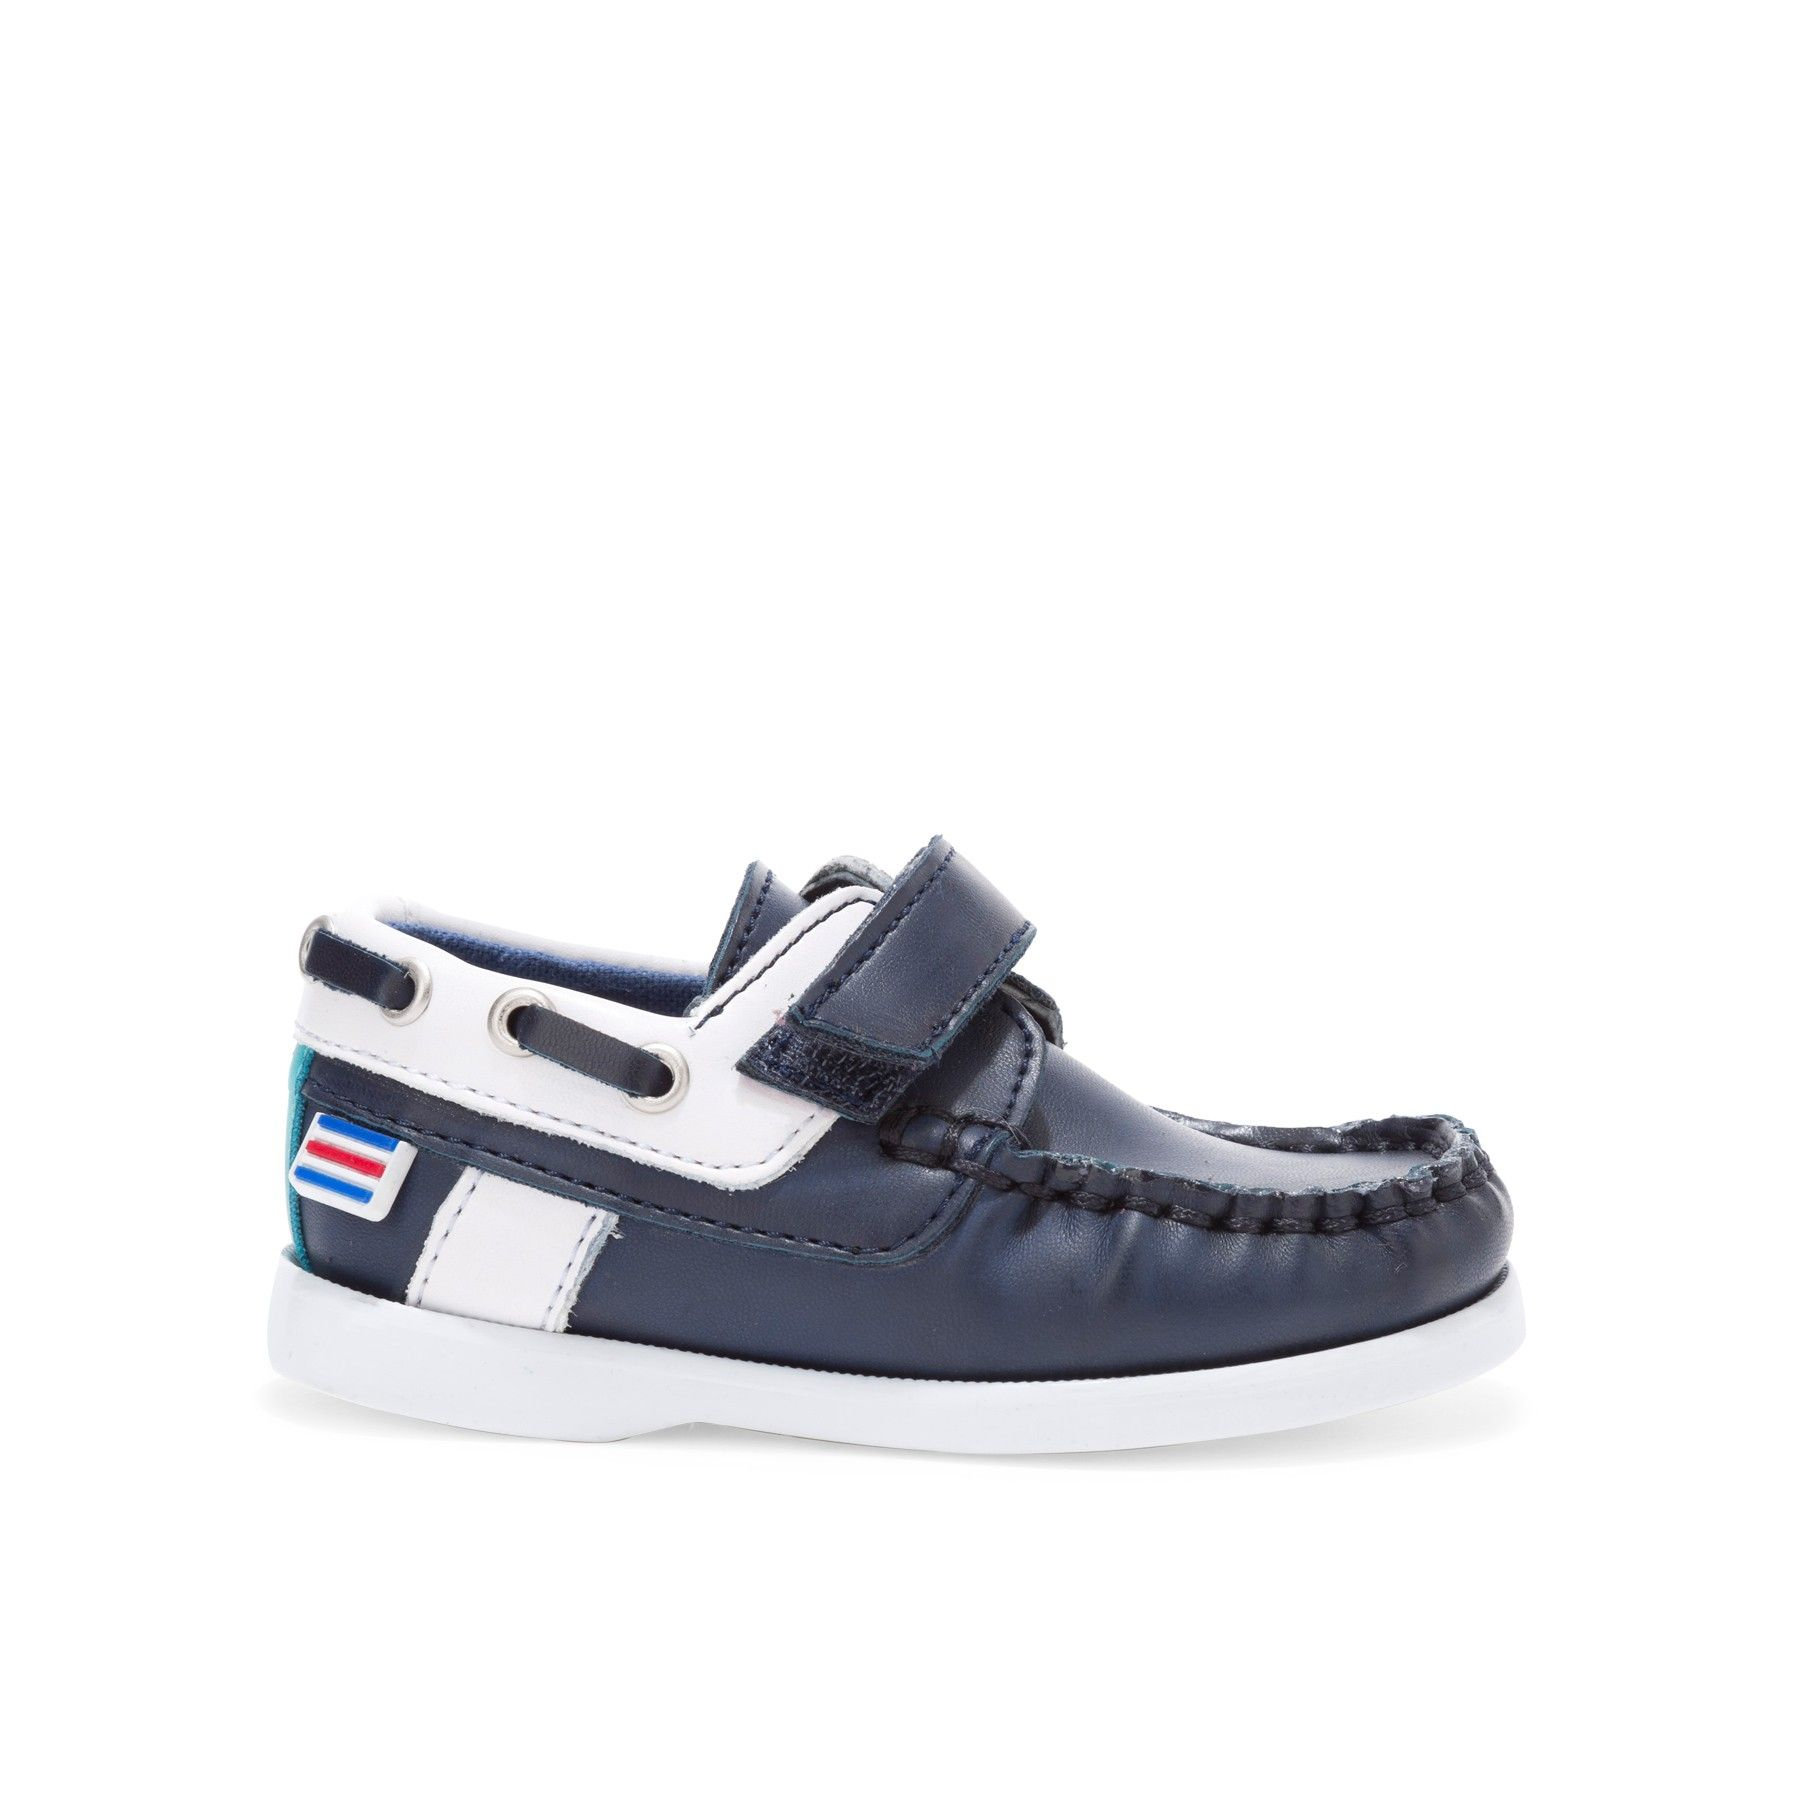 Chaussures Bleues Avec Velcro Ronde Enfants Toe yJmSgIb2